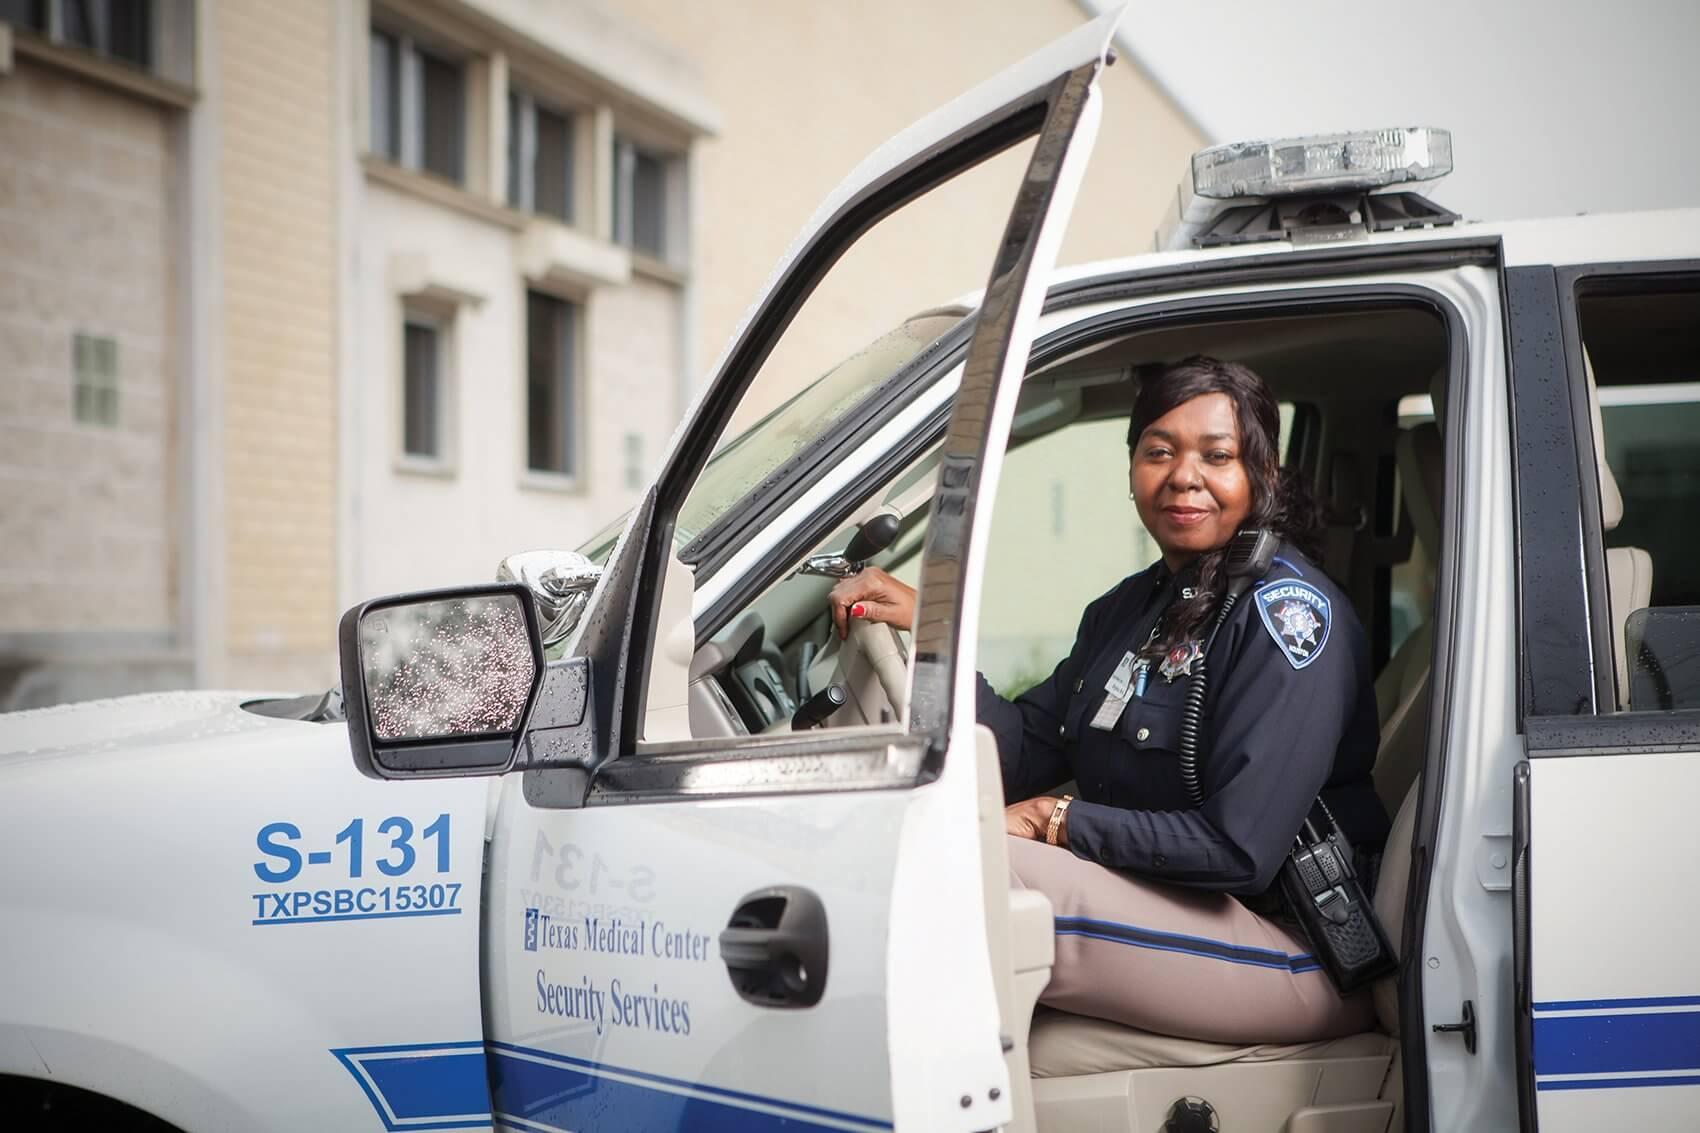 Regina Bell, Proprietary Security Officer, Texas Medical Center